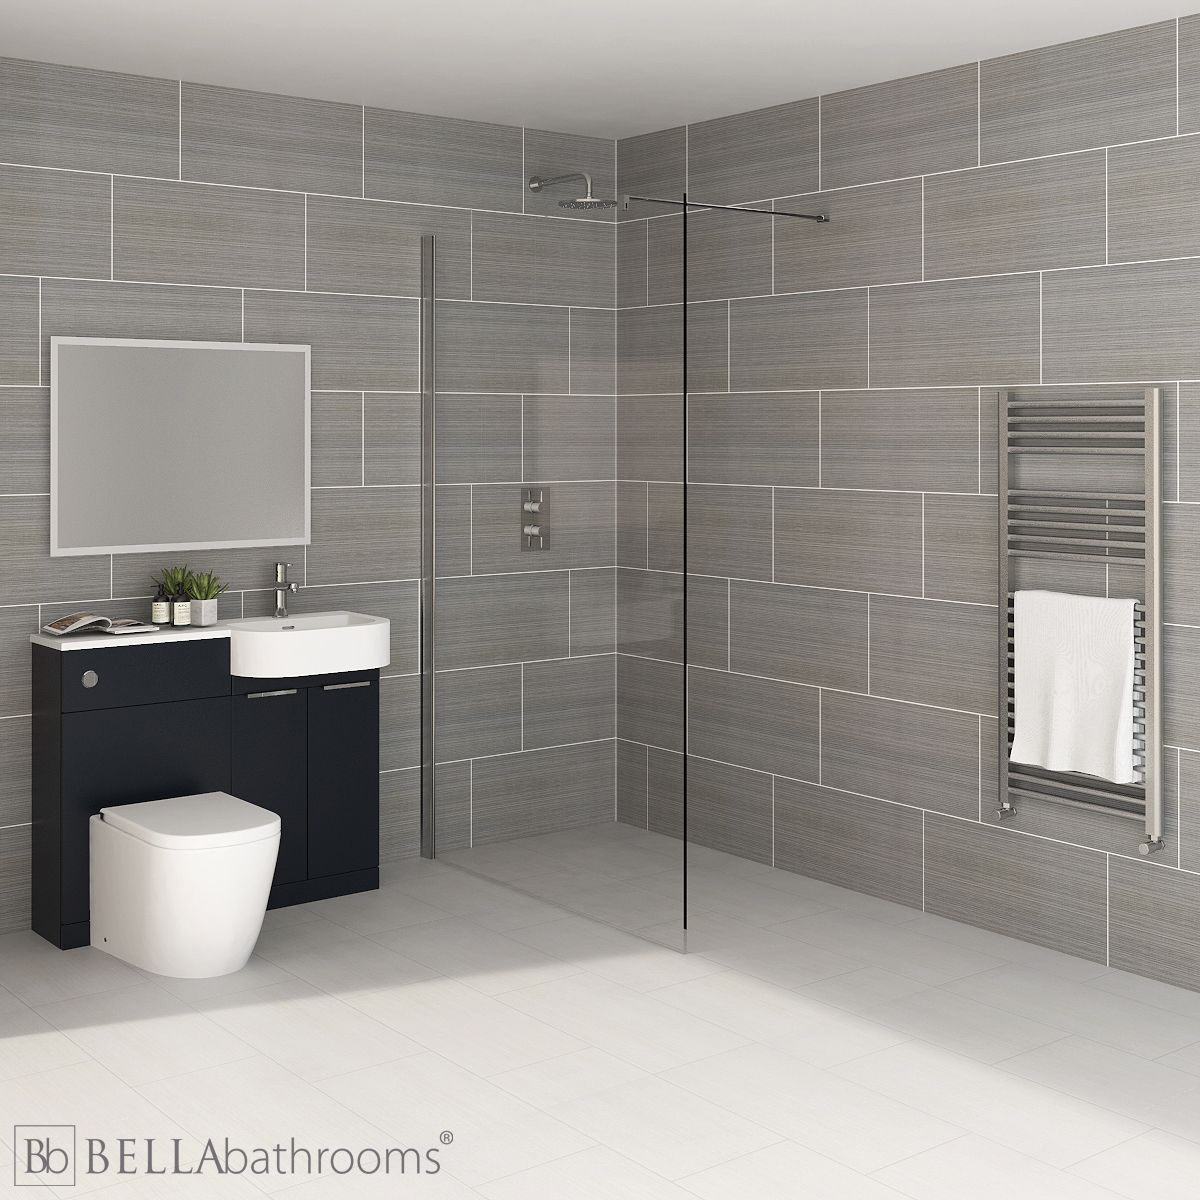 Elation Combination P Shape Indigo Matt Furniture Suite with April Destini Wet Room Shower Enclosure with Cayton Toilet